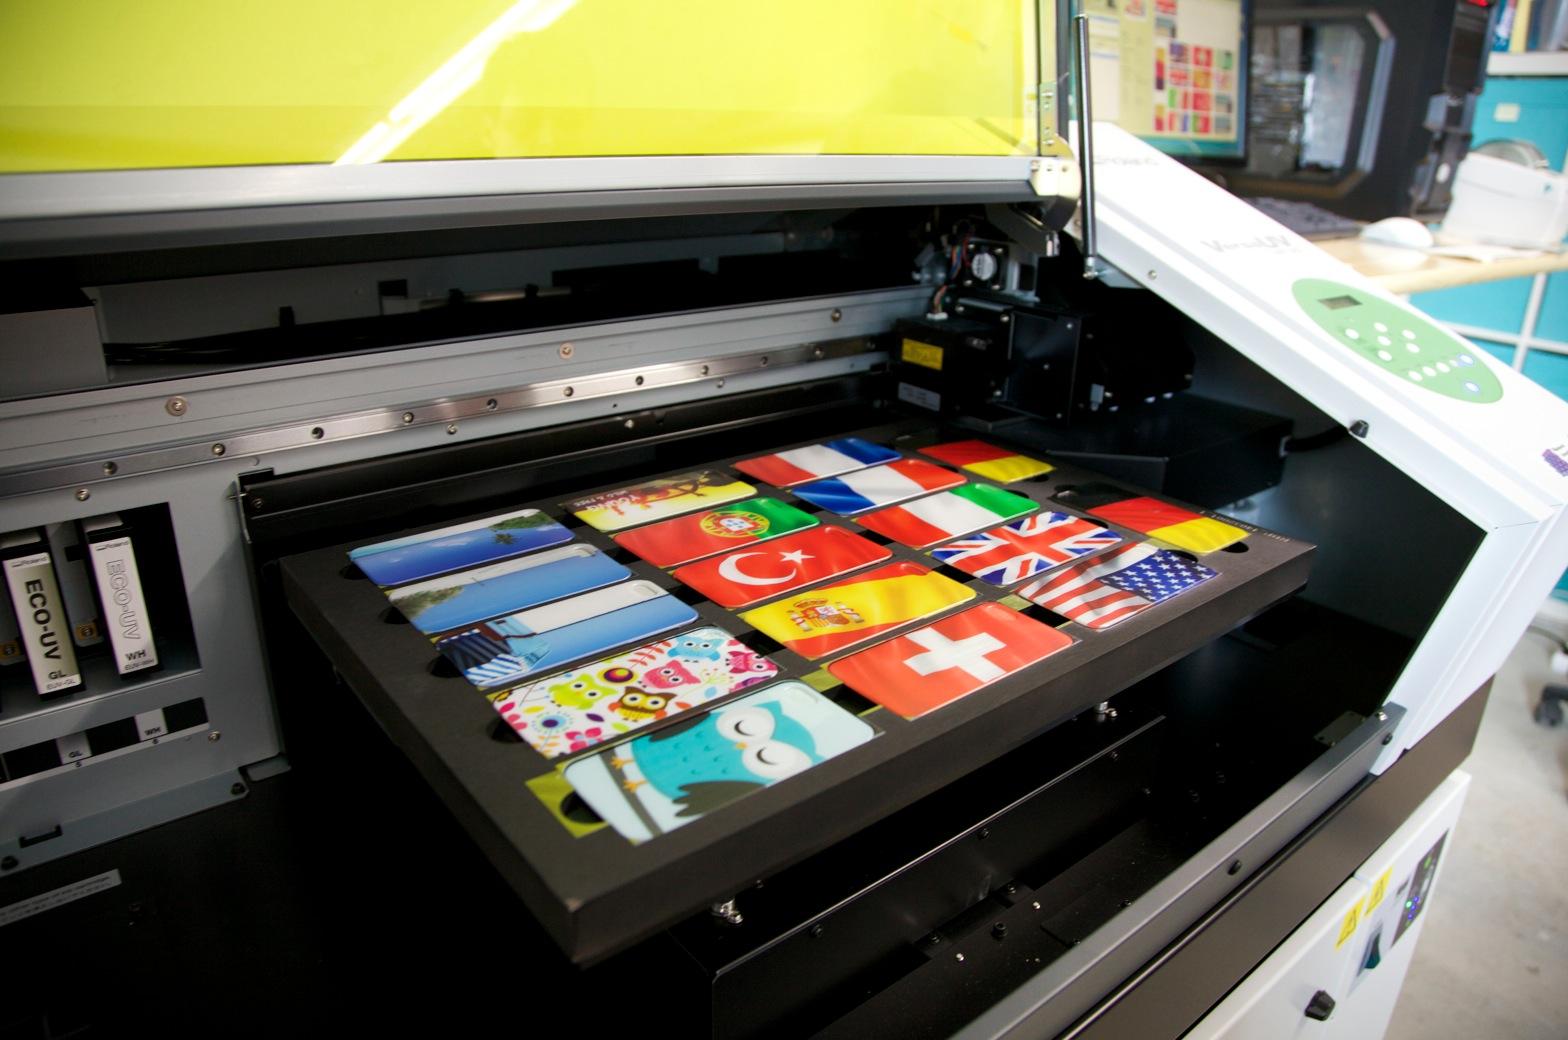 Roland LEF 200 UV Printer